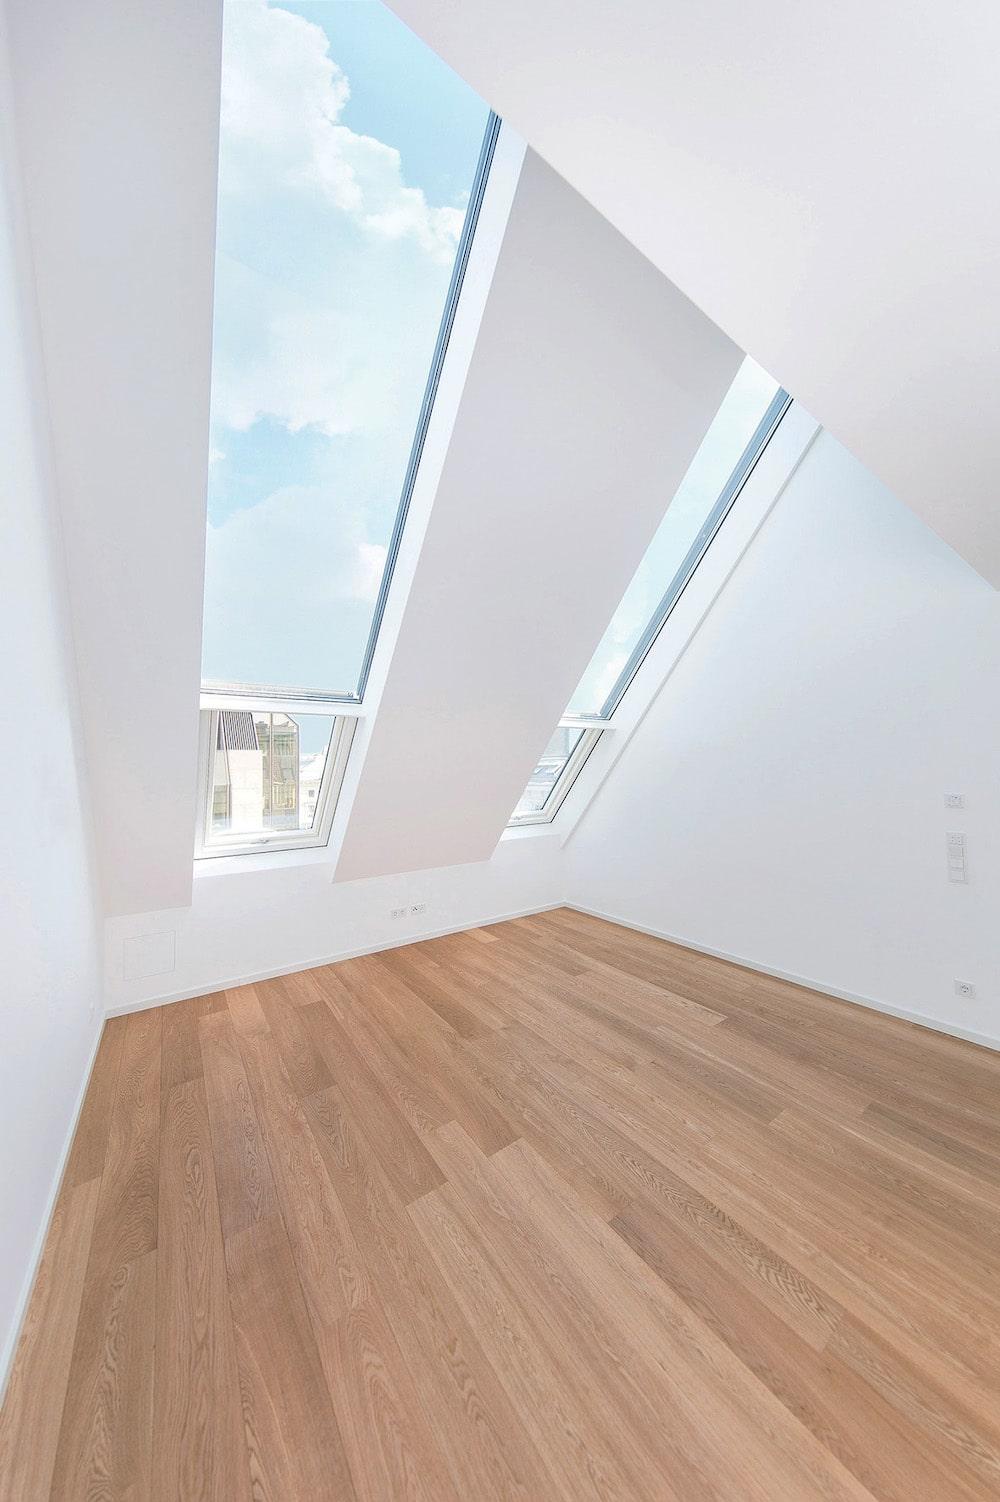 fakro-finestre-tetto-vienna